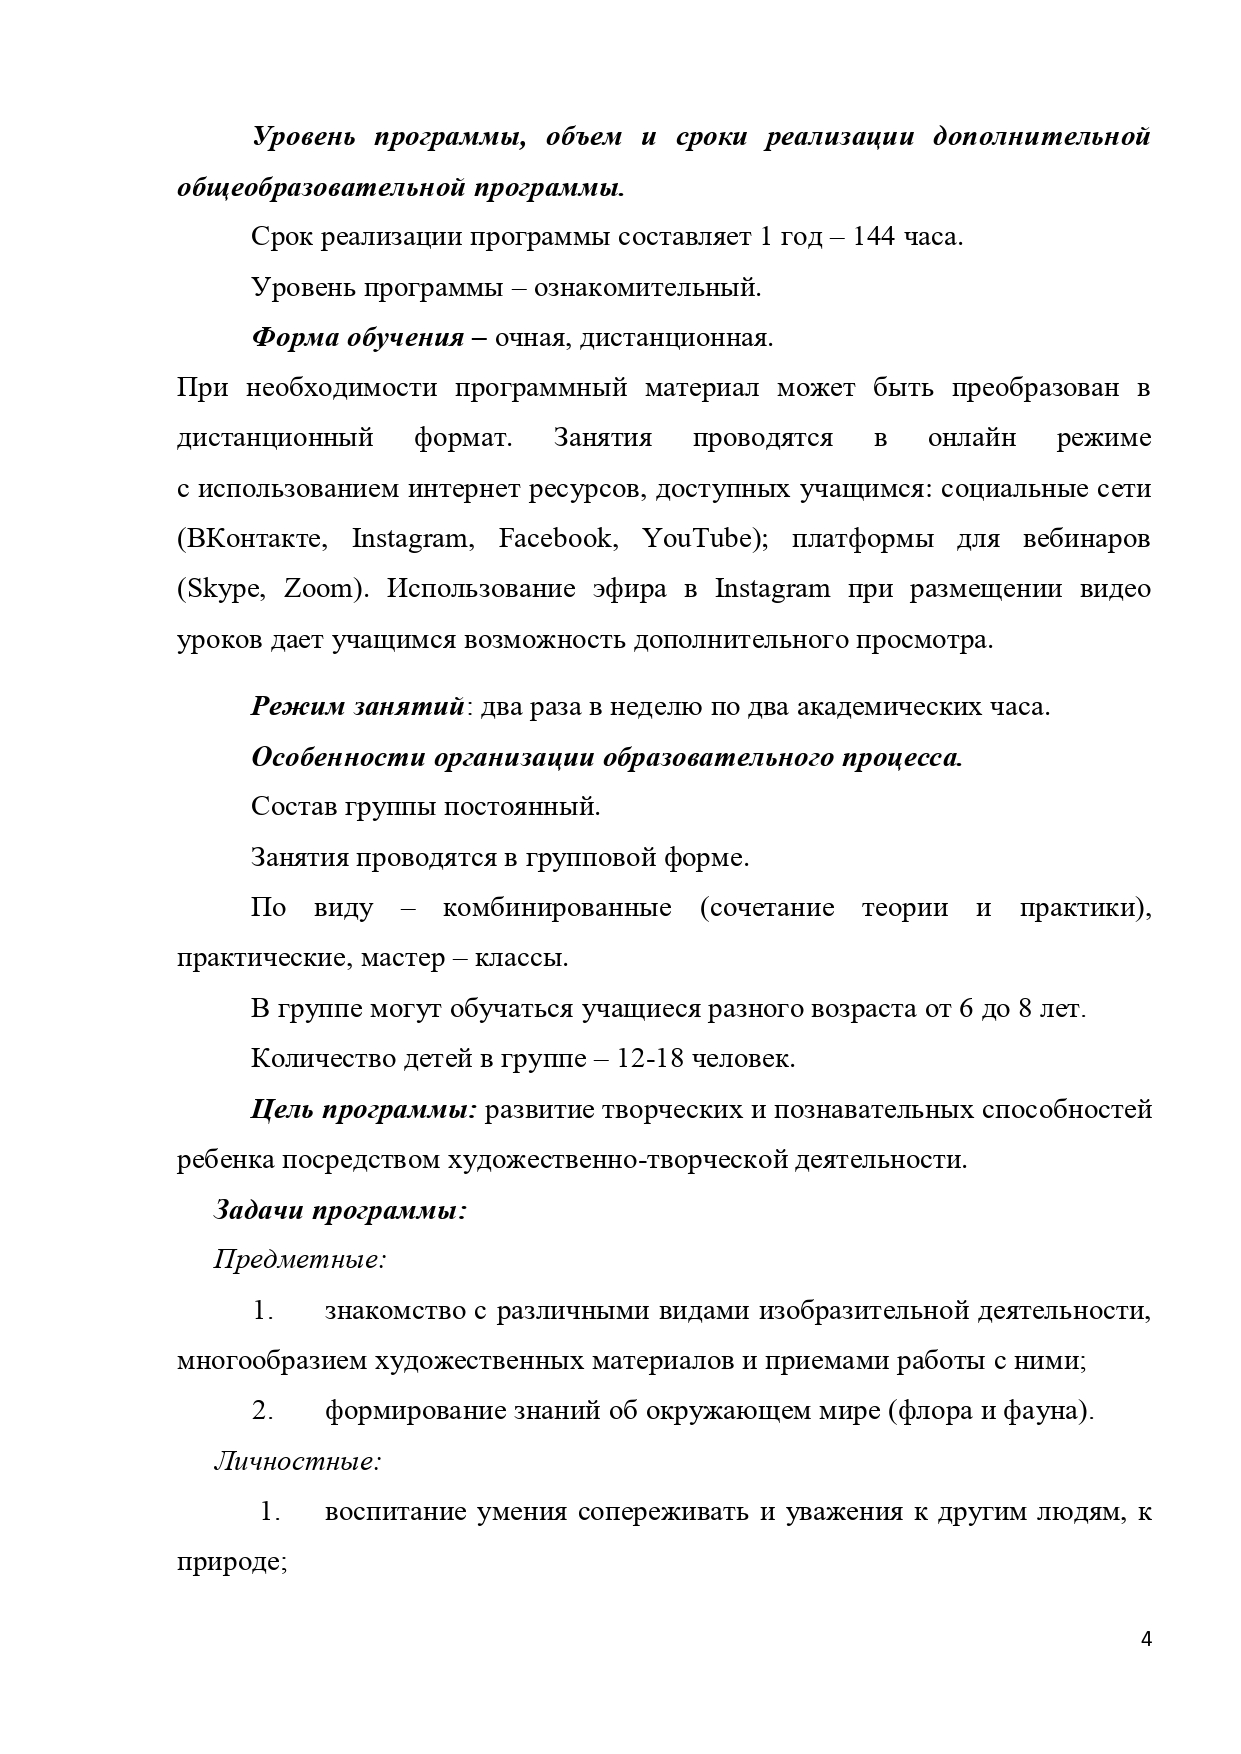 ДООП От познания к творчеству_pages-to-jpg-0004